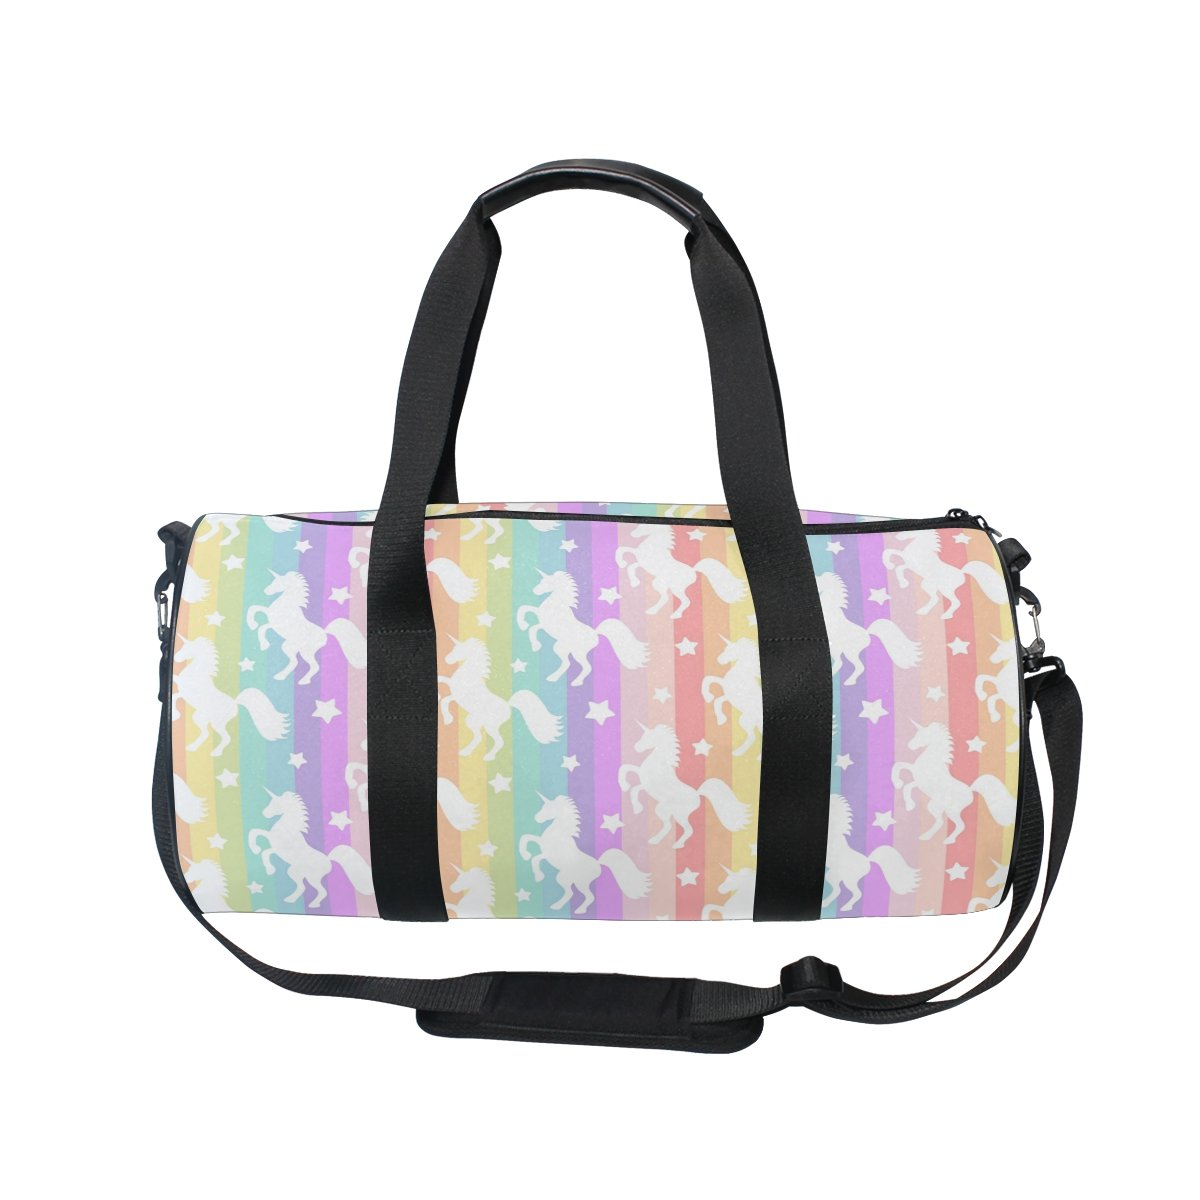 ALAZA Colorful Rainbow Unicorn Sports Gym Duffel Bag Travel Luggage Handbag for Men Women